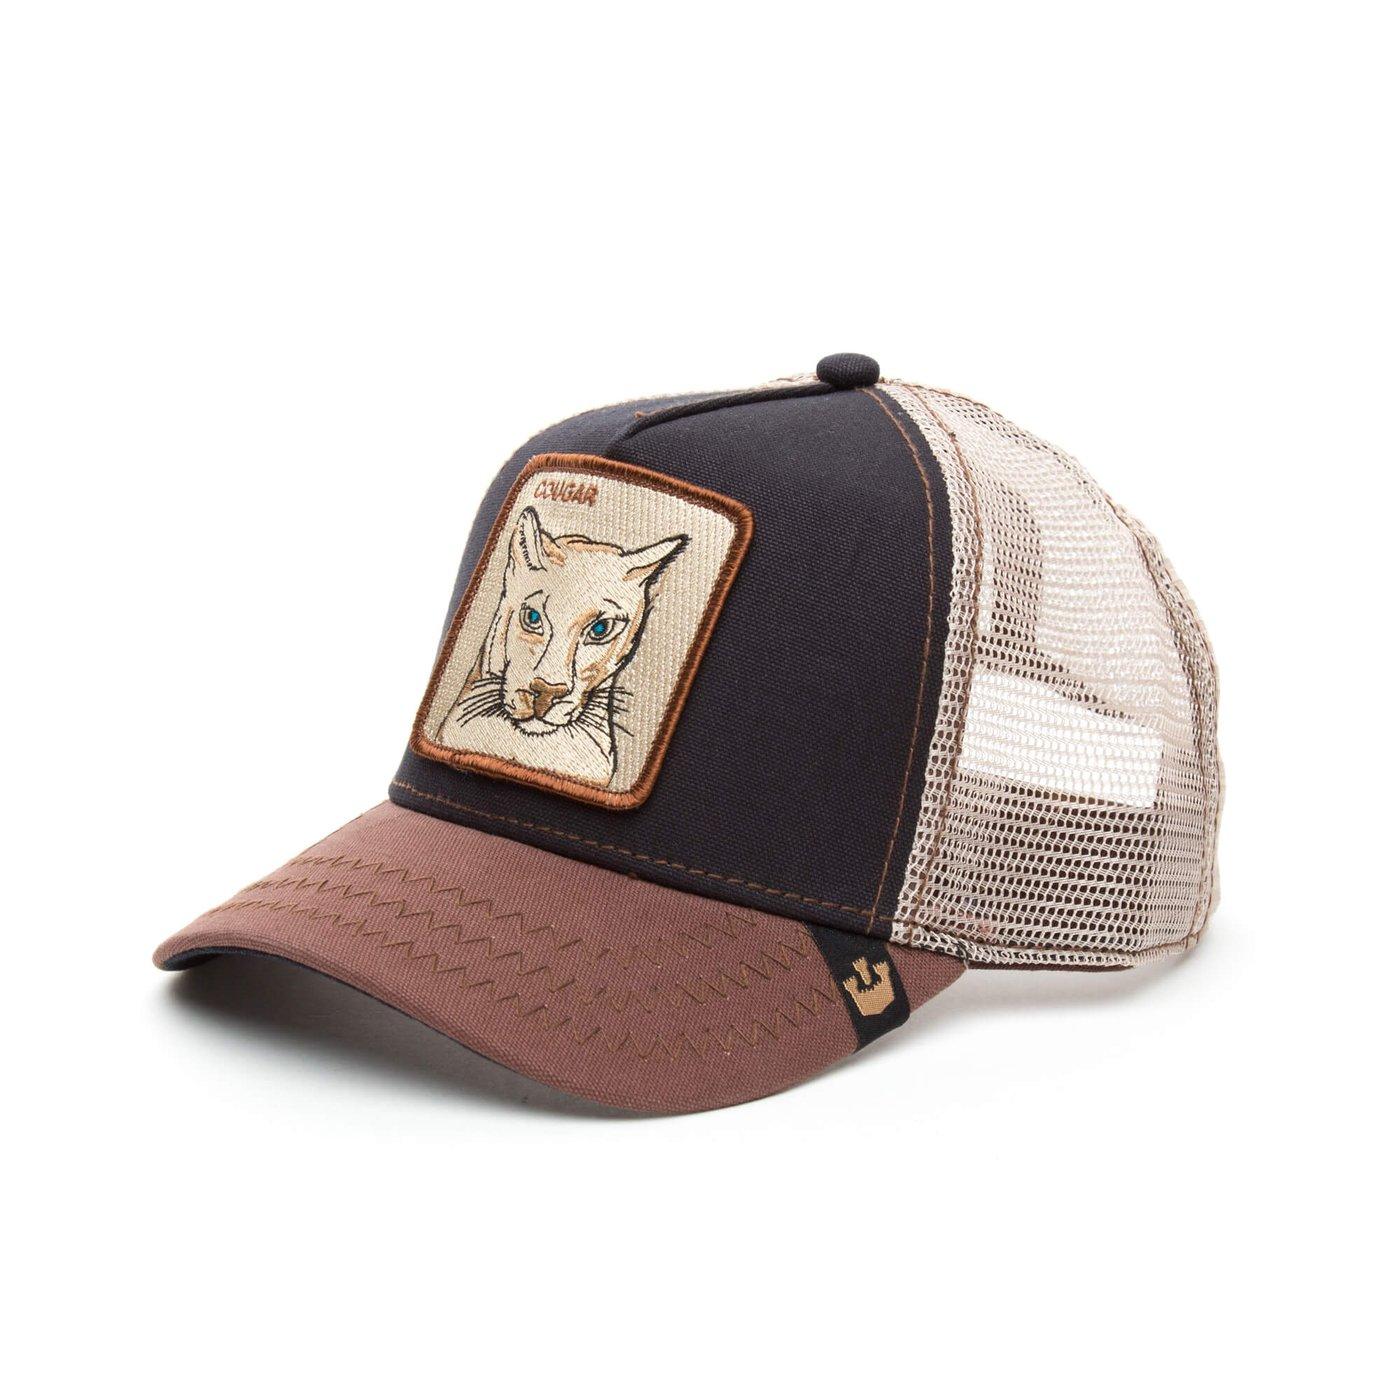 Goorin Bros Cougar Unisex Lacivert Şapka